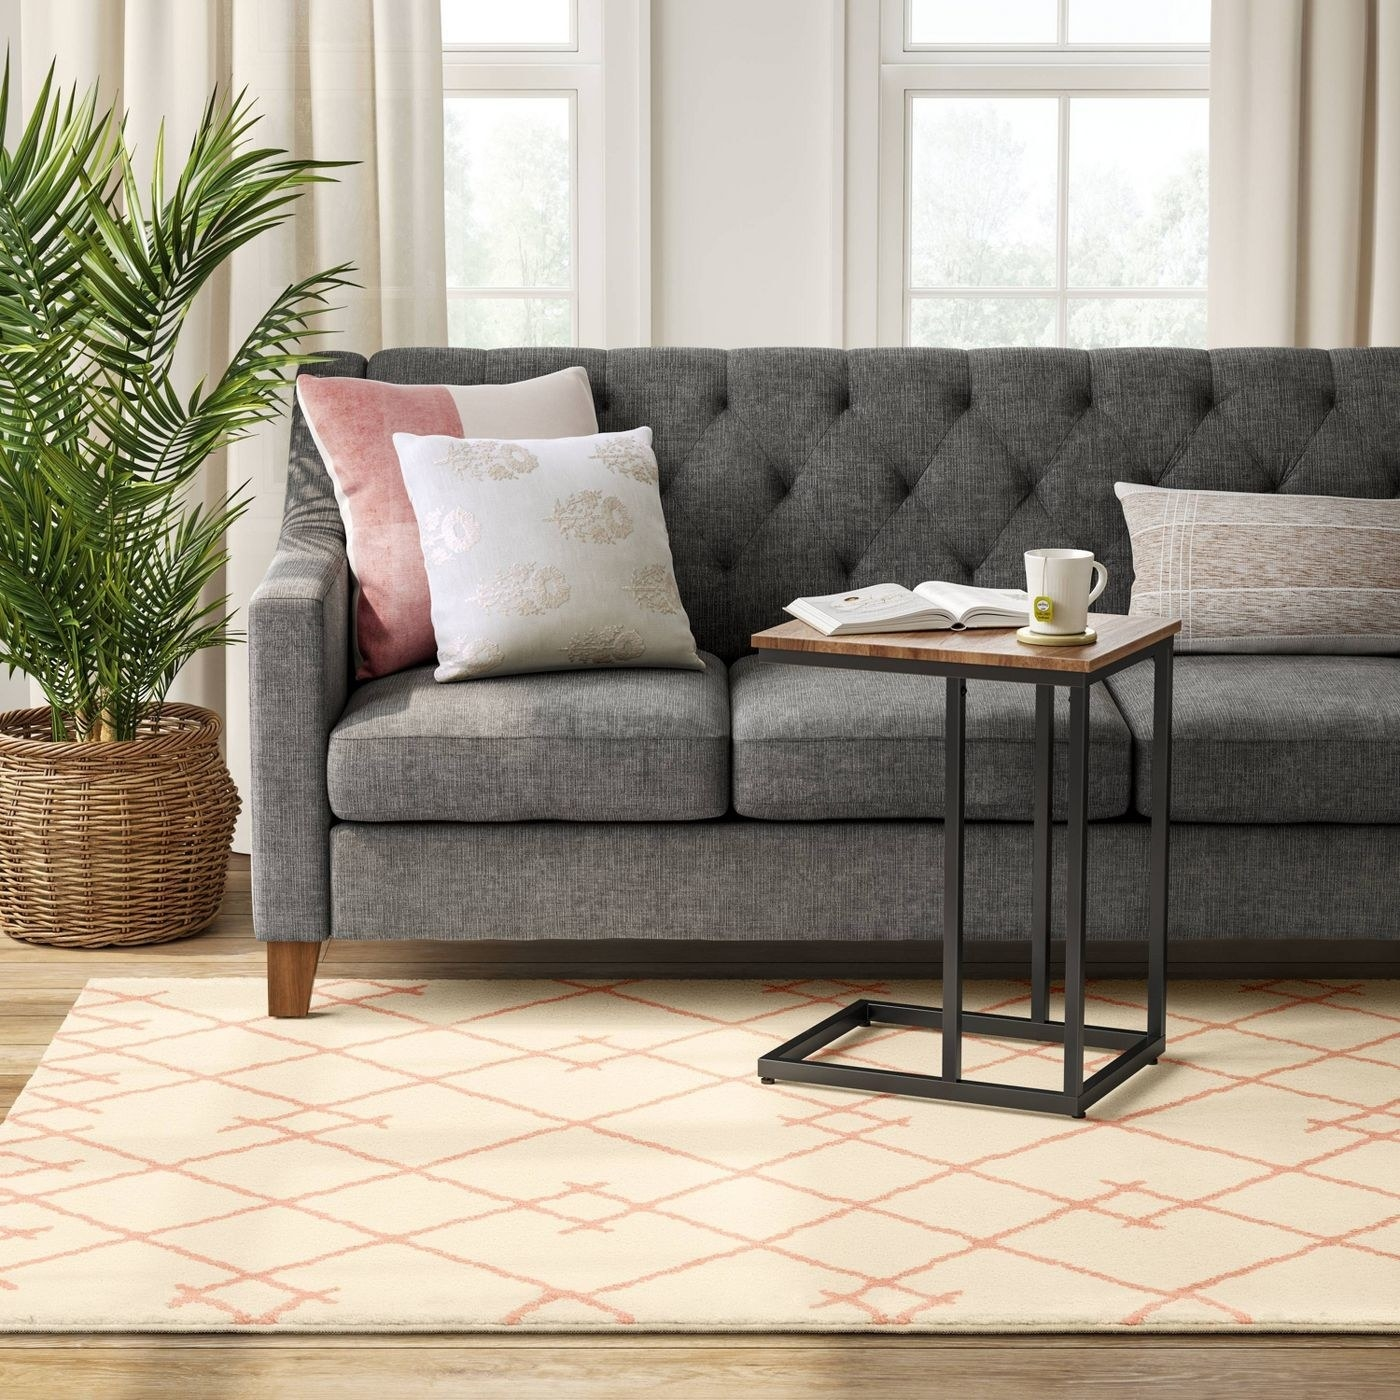 The blush pink floor rug